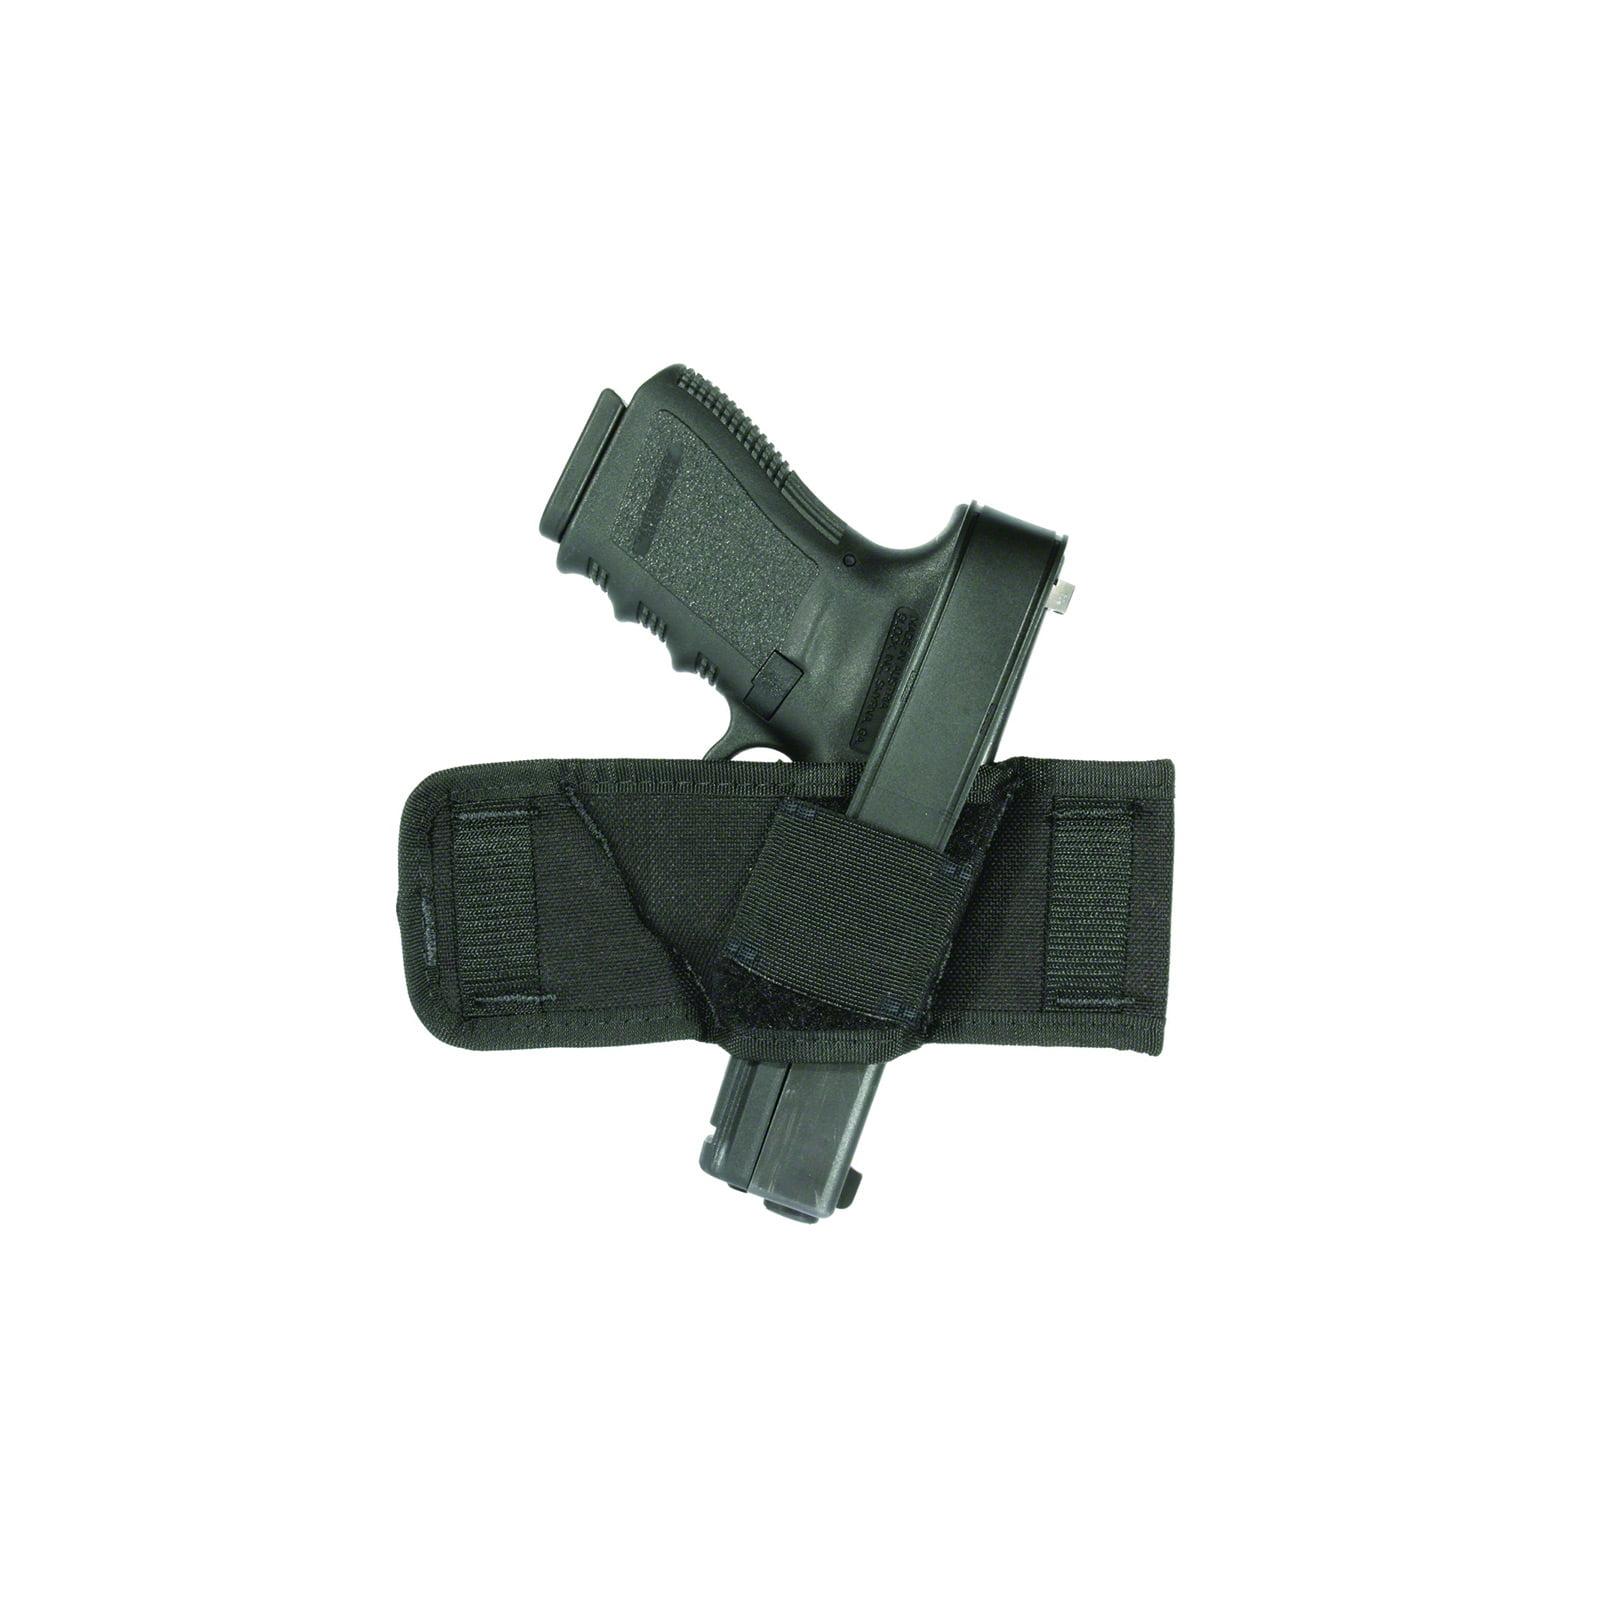 Blackhawk Sportster Compct Belt Slid Holster Most Autos/Rev, B990260BK